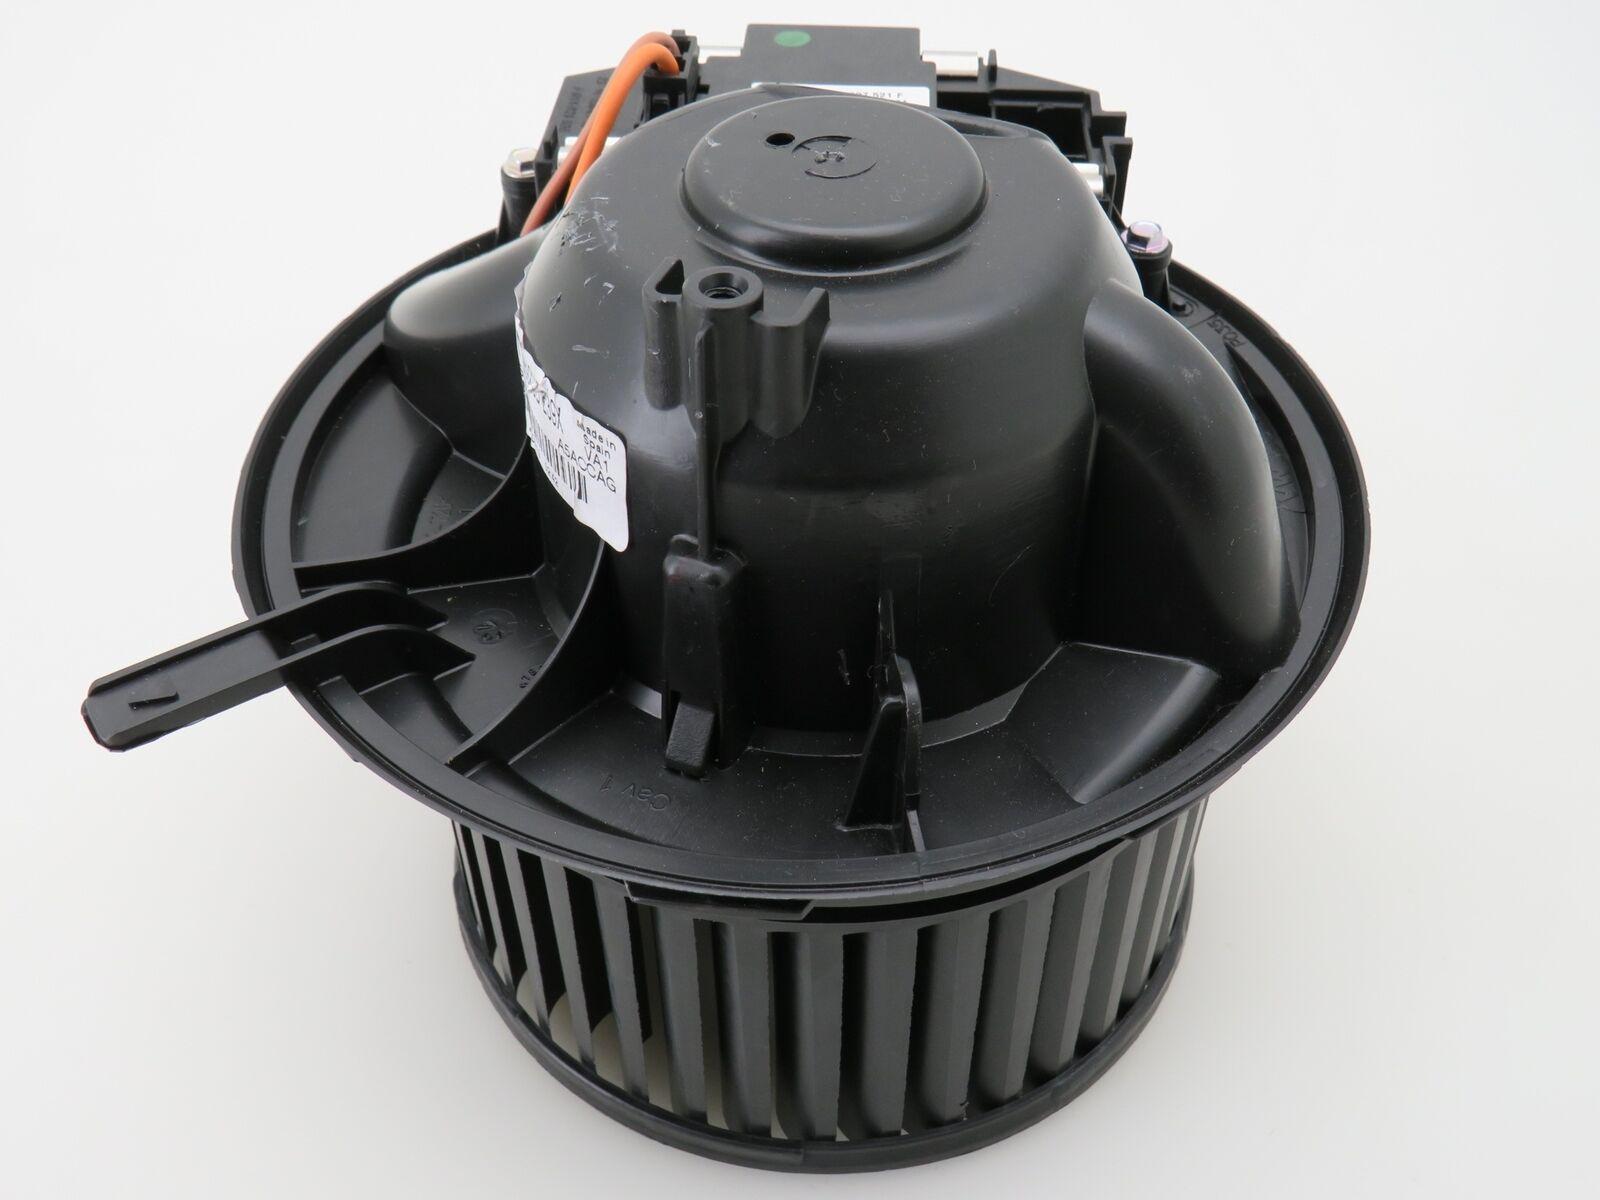 Gebläsemsotor Automatic Air Conditioning Blower Motor VW Caddy 2K Eos 1F Golf 6